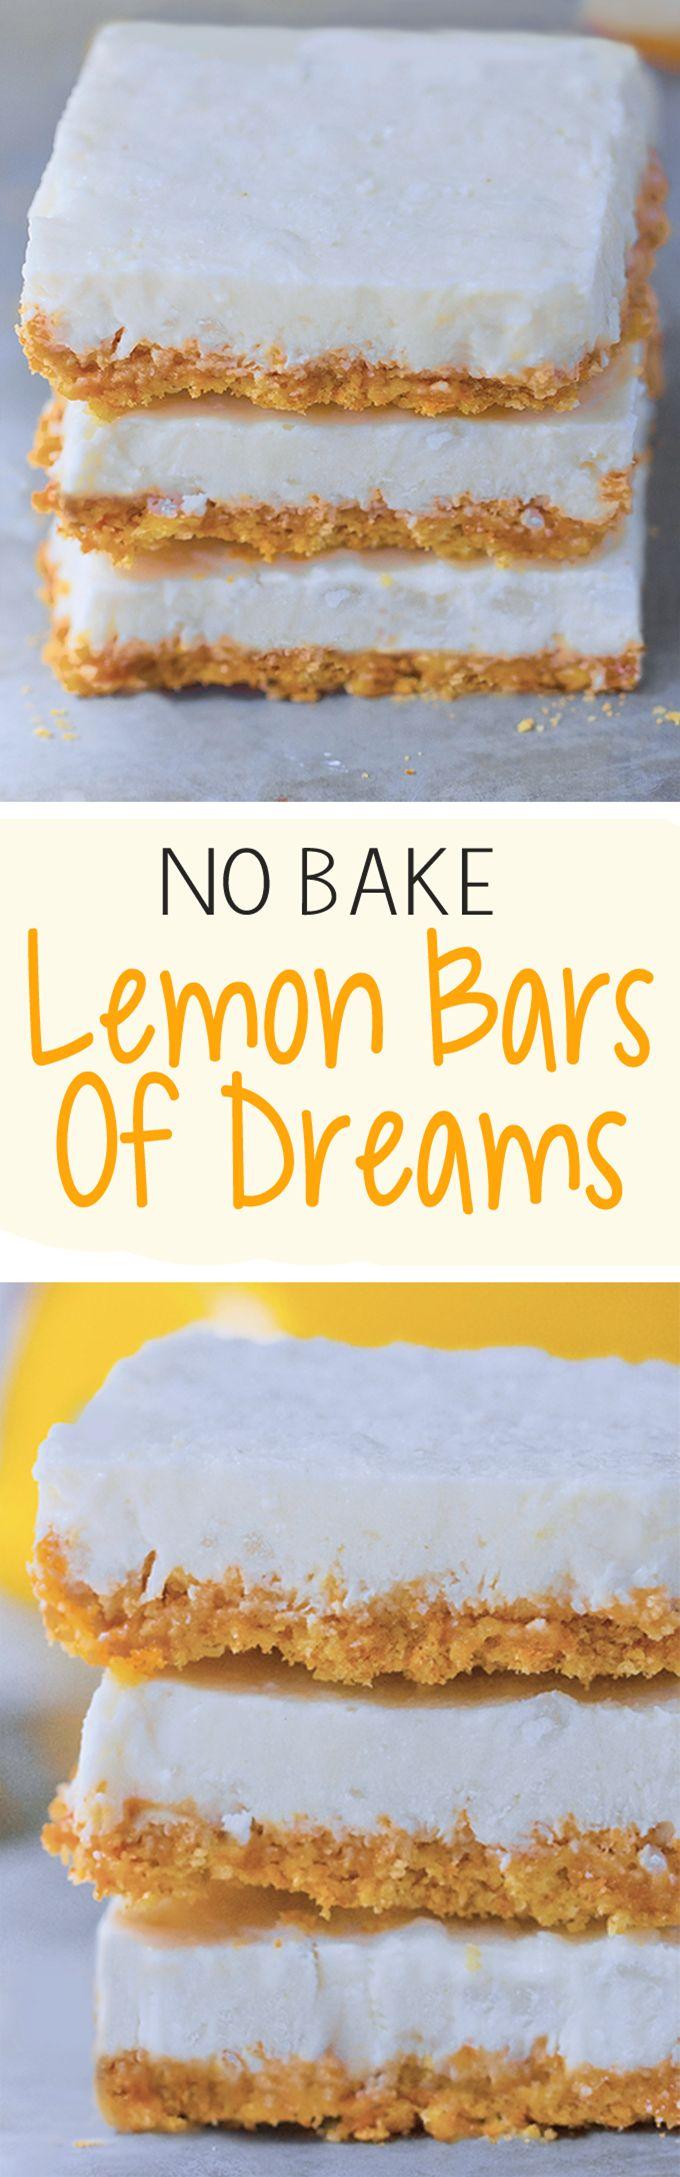 HEALTHY LEMON BARS - Ingredients: 1 tbsp lemon juice, 2 tbsp pure maple syrup, 1 tsp lemon zest, 1/2 cup… Full recipe>> @choccoveredkt http://chocolatecoveredkatie.com